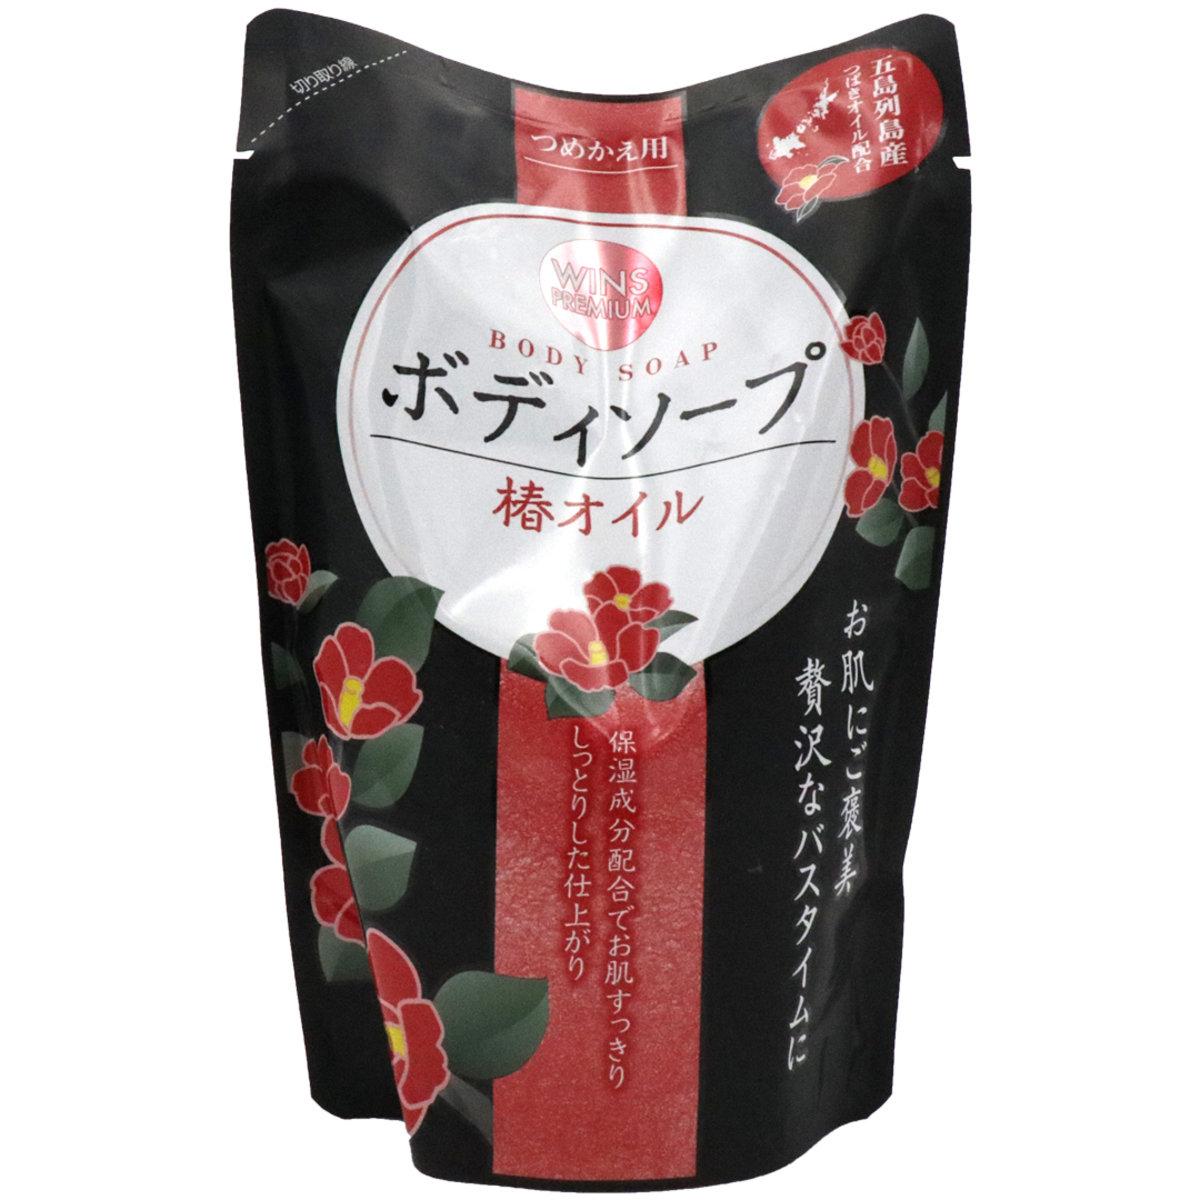 Nihon Detergent Wins Premium Huanhua Camellia Oil Body Soap Refill  400ml